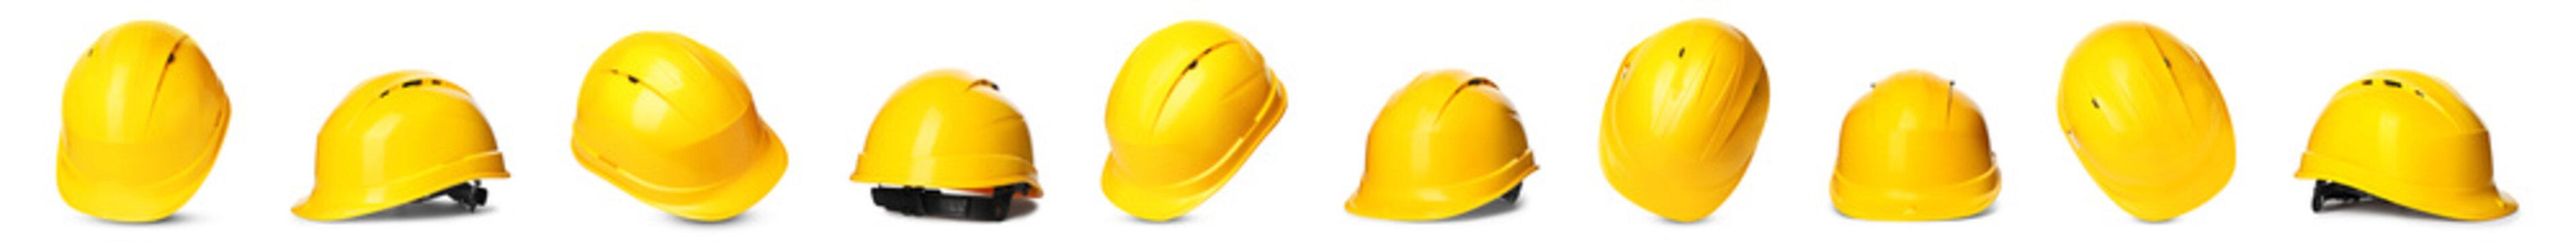 Set of yellow hardhats on white background. Banner design